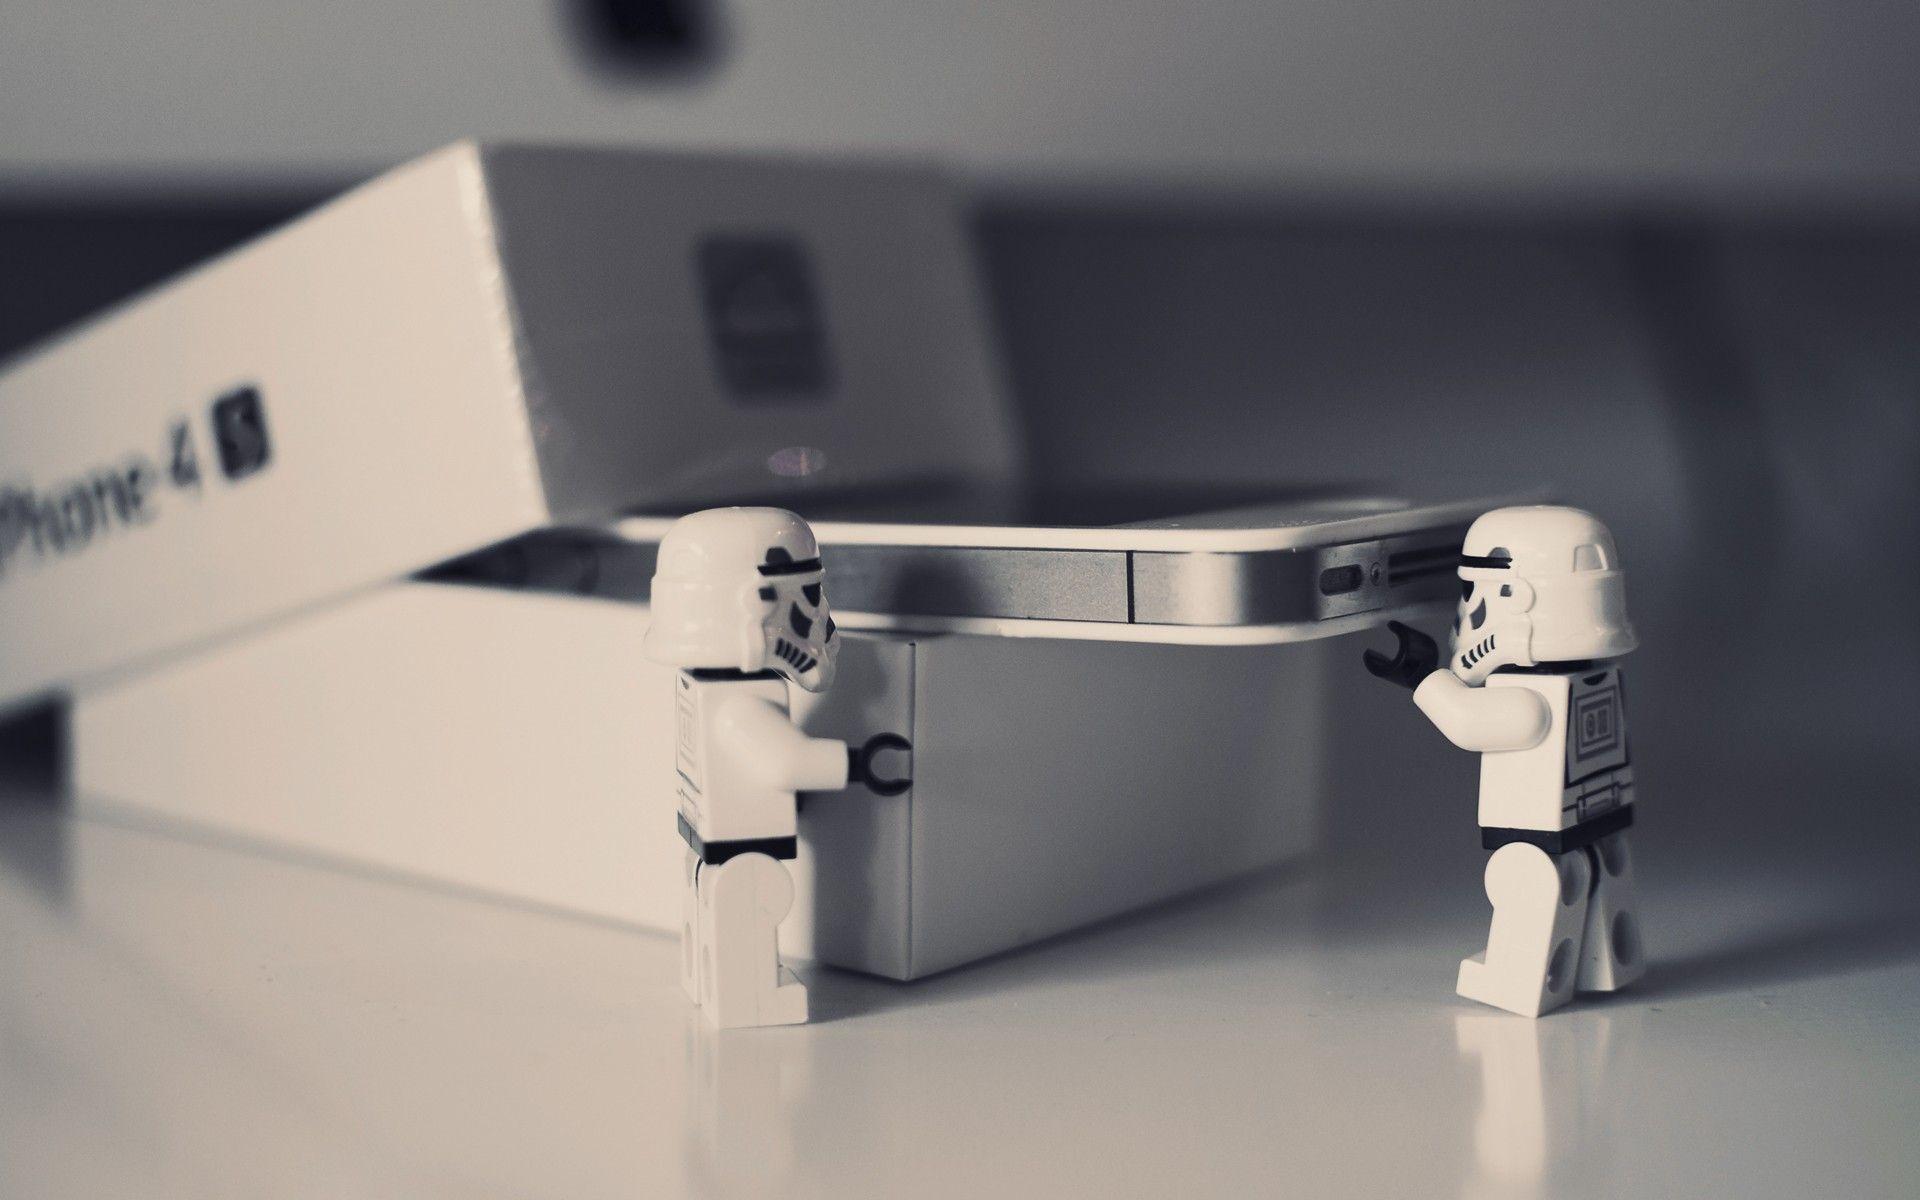 lego star wars wallpaper | lego | pinterest | star wars wallpaper